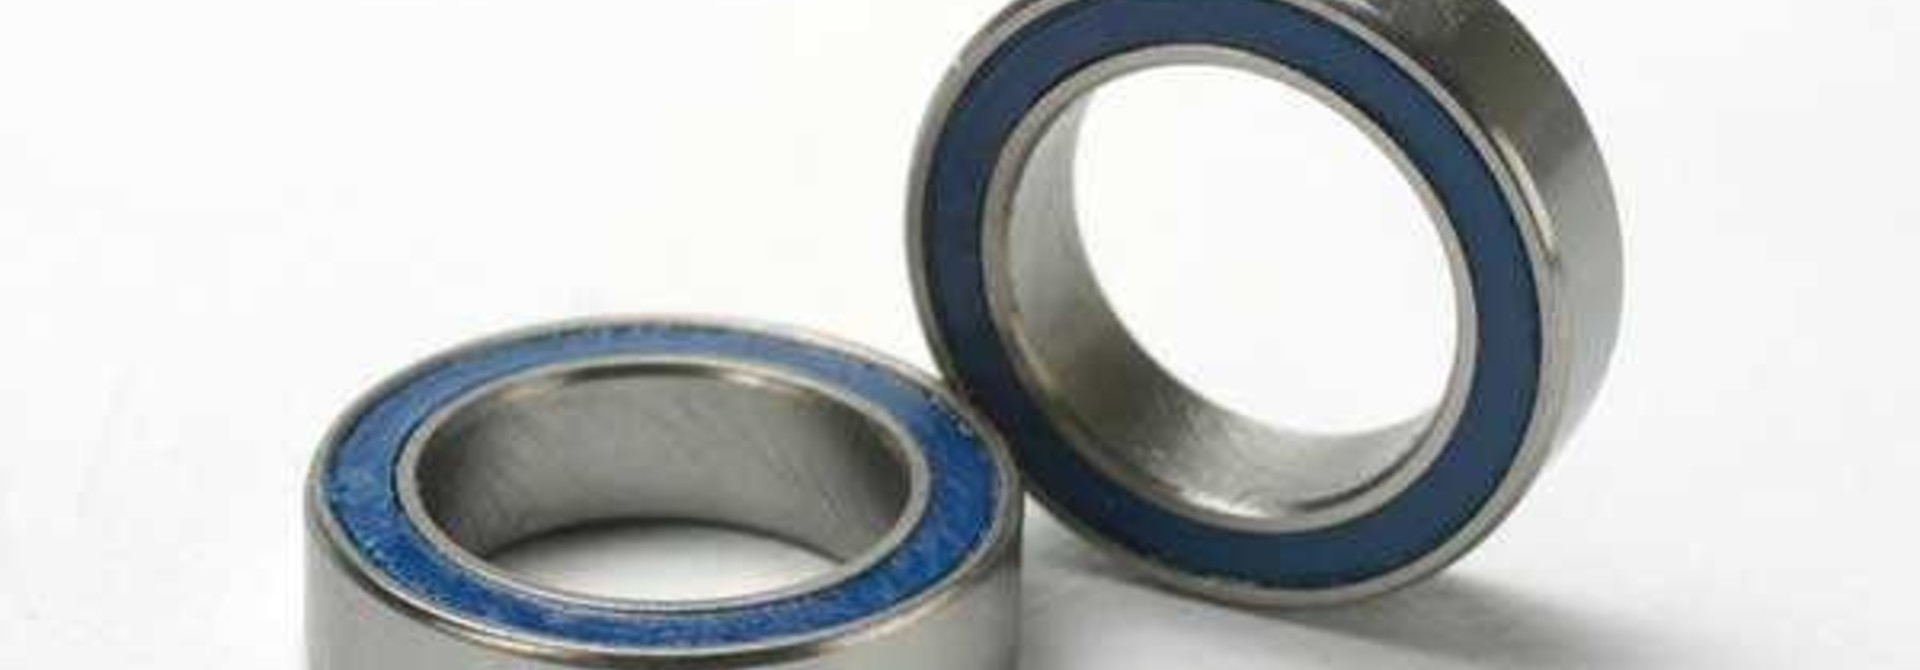 Ball bearings, blue rubber sealed (10x15x4mm) (2), TRX5119